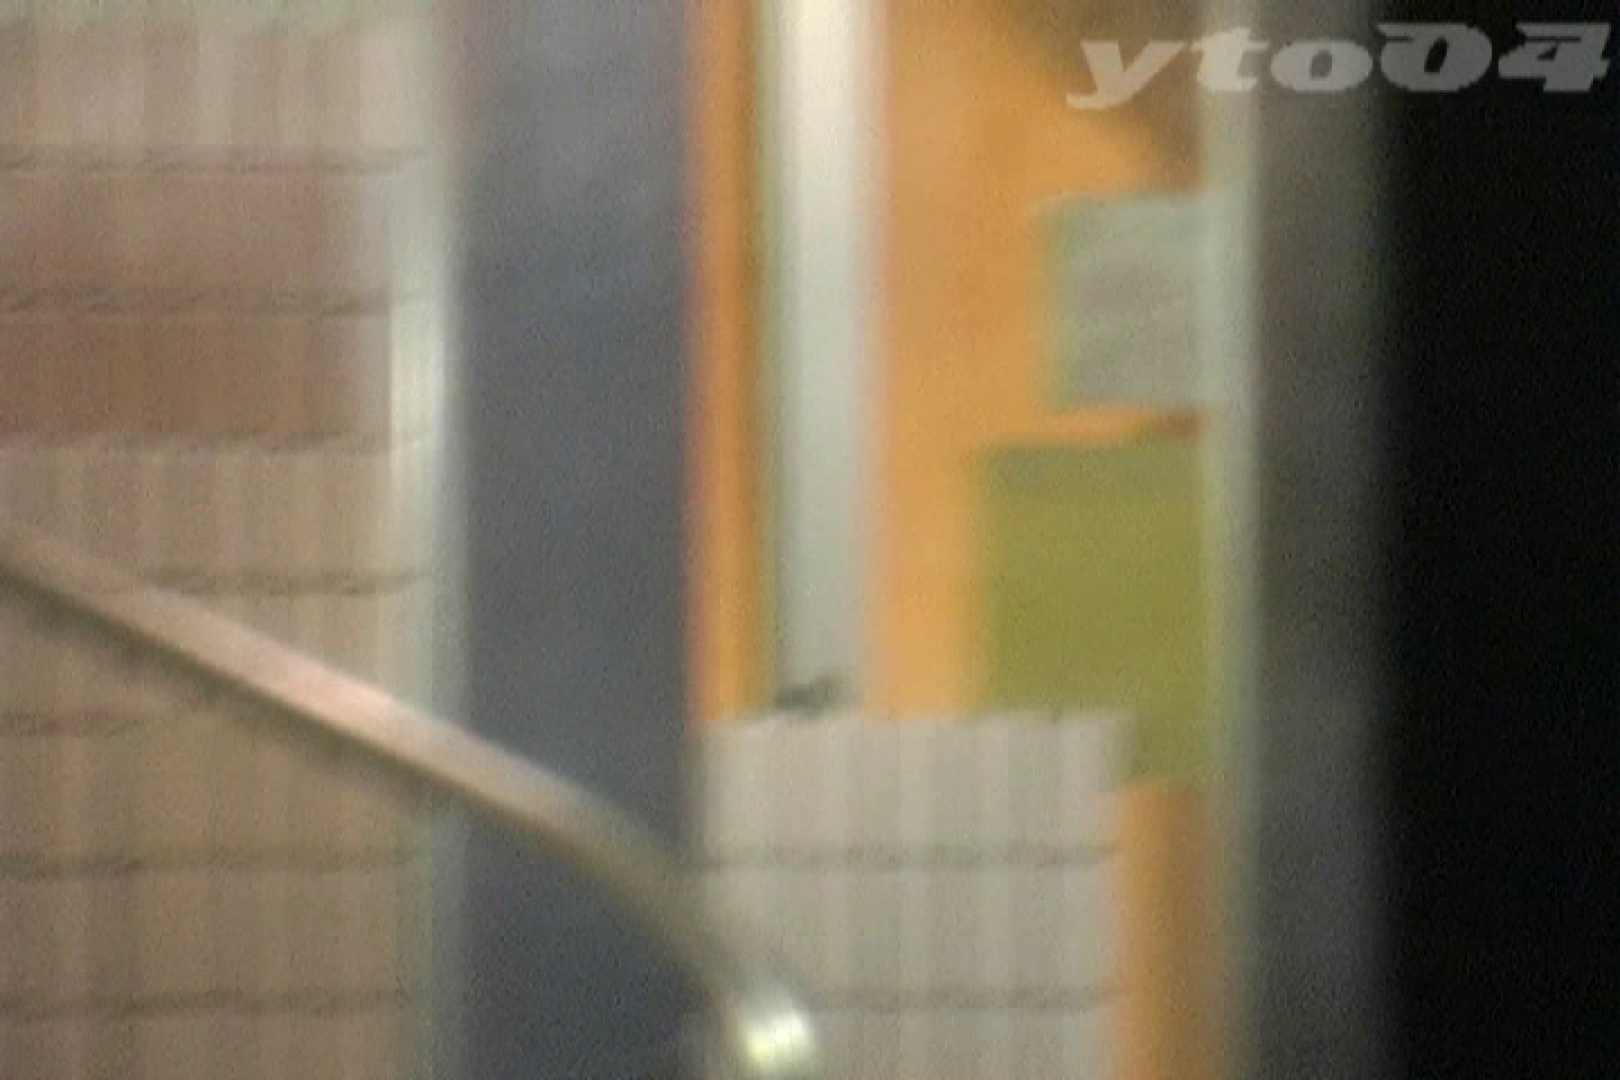 ▲復活限定▲合宿ホテル女風呂盗撮 Vol.24 名作  55pic 35